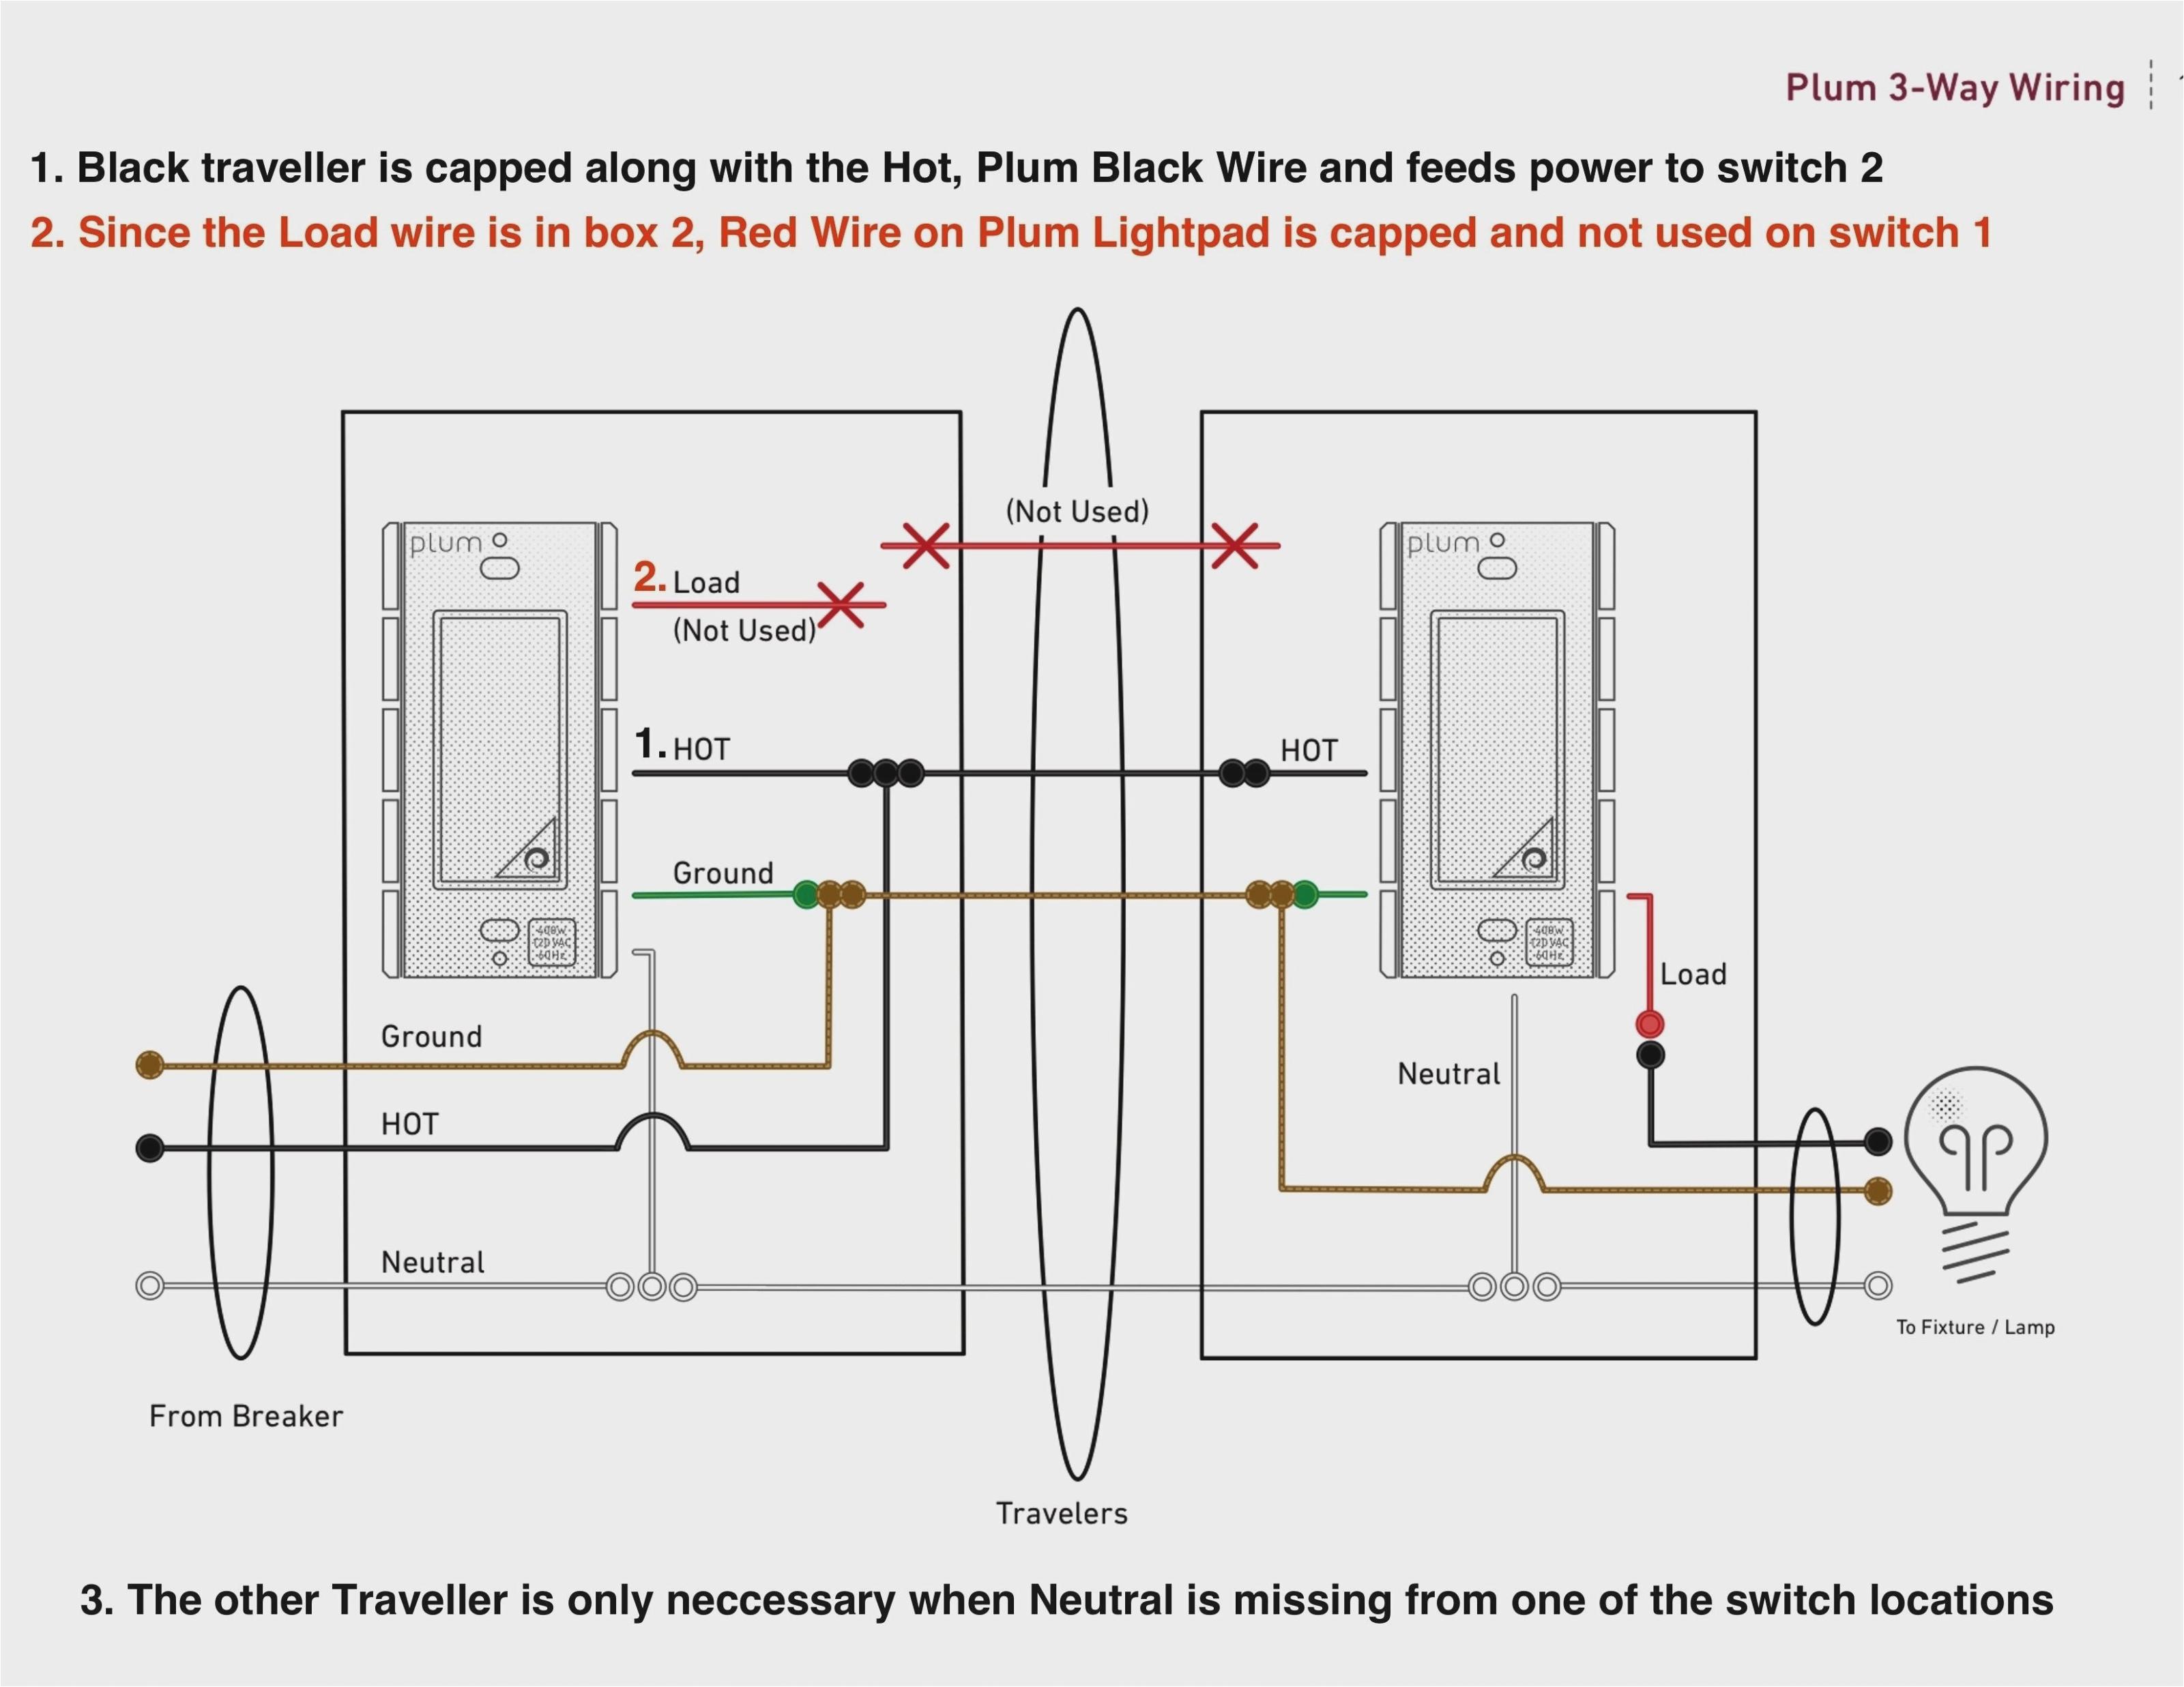 Lutron Occupancy Sensor Wiring Diagram Lutron Dimmer Switch Wiring Diagram 3 Way Switch Schematic Wiring